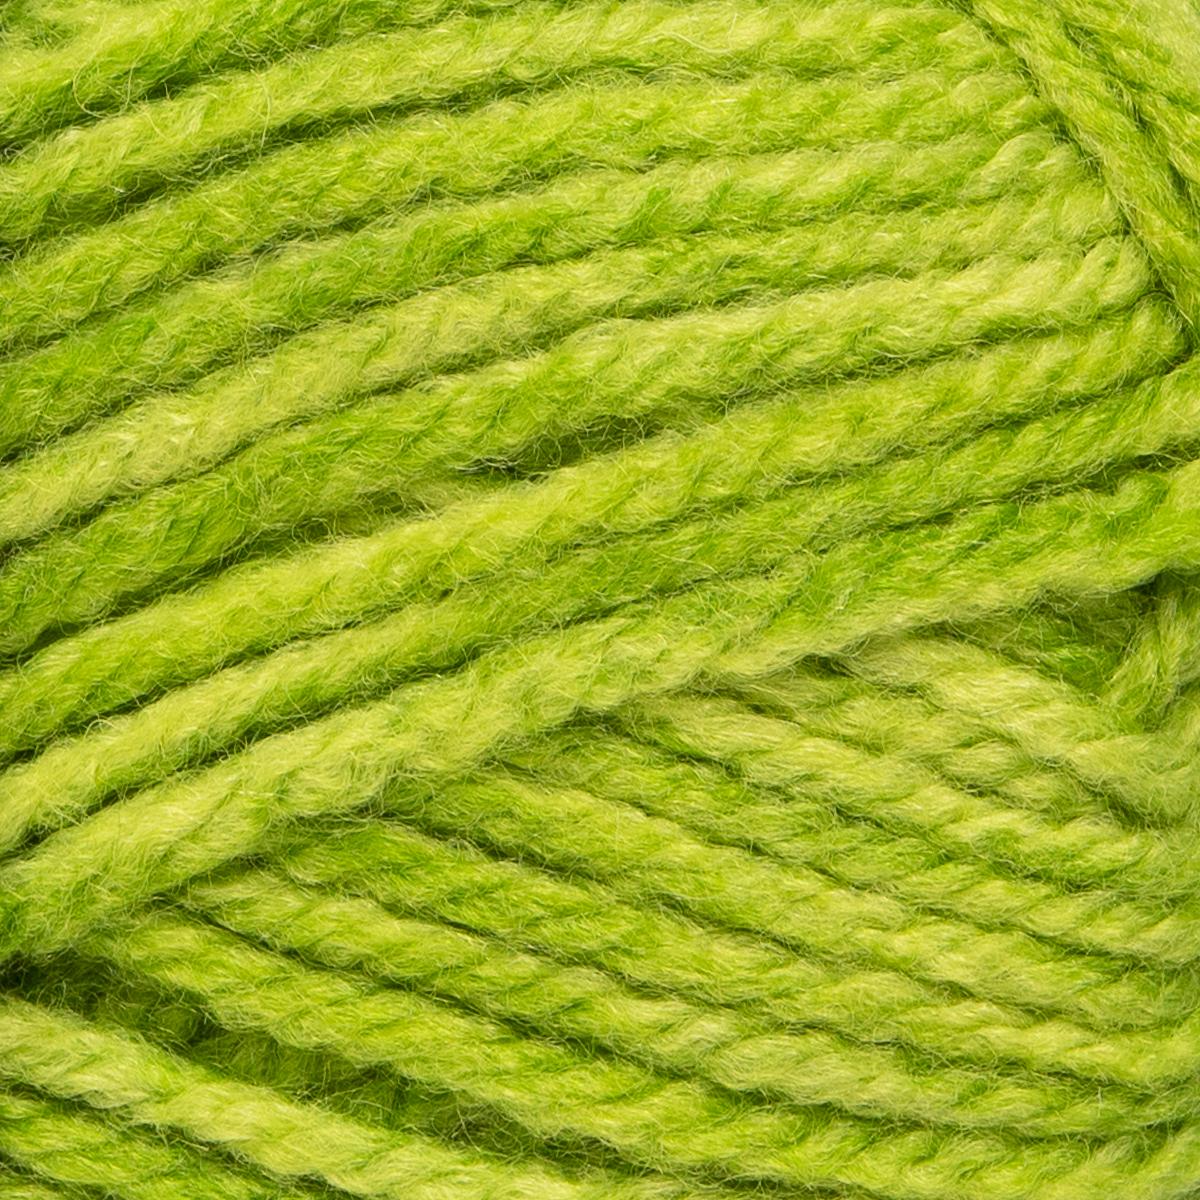 3pk-Lion-Brand-Yarn-Acrylic-amp-Wool-Chunky-Yarn-Bulky-5-Soft-Knitting-Crocheting thumbnail 14